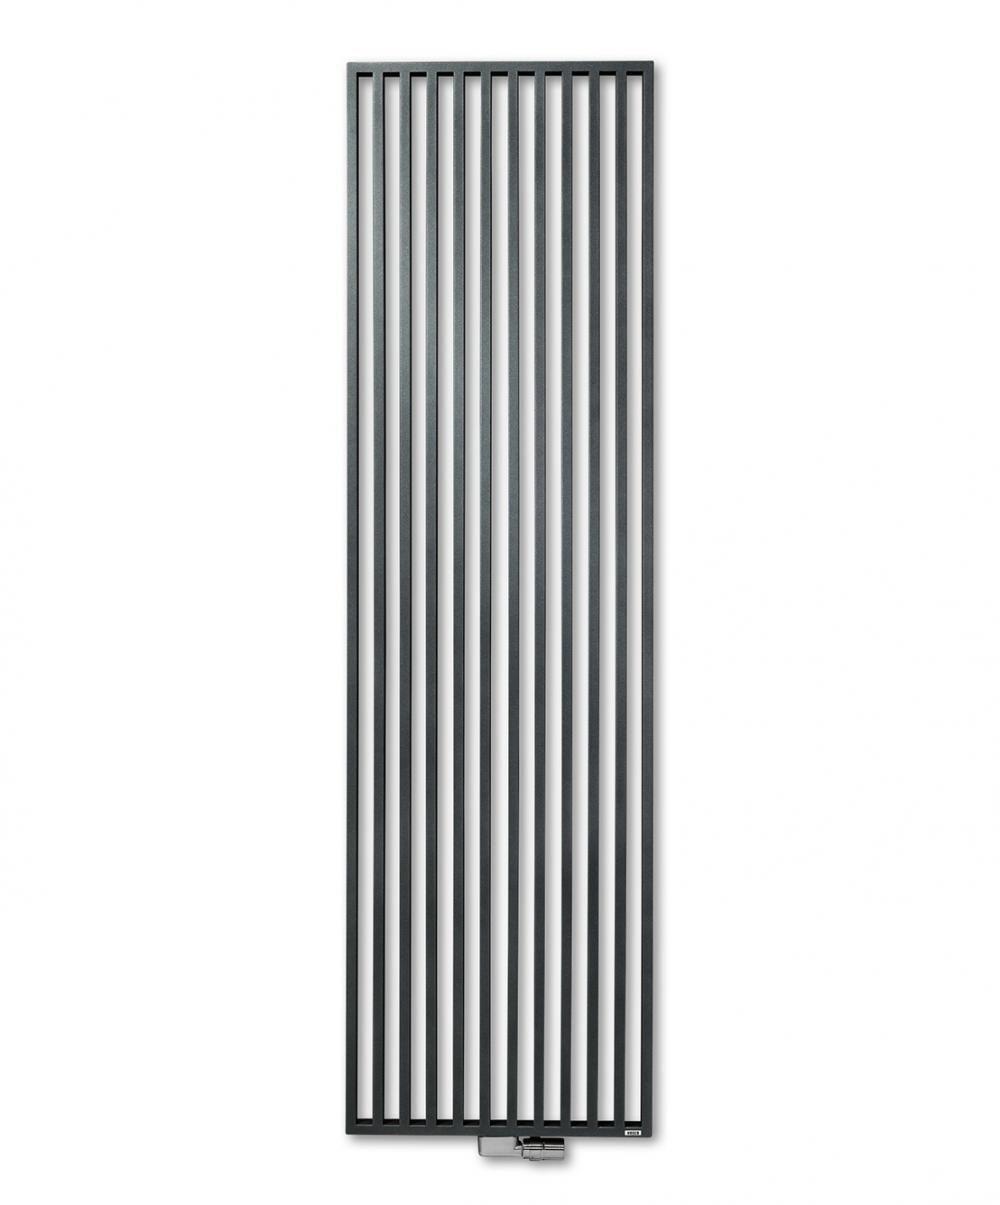 Calorifere verticale otel Vasco Arche VV 2200x670 mm, 1824 W